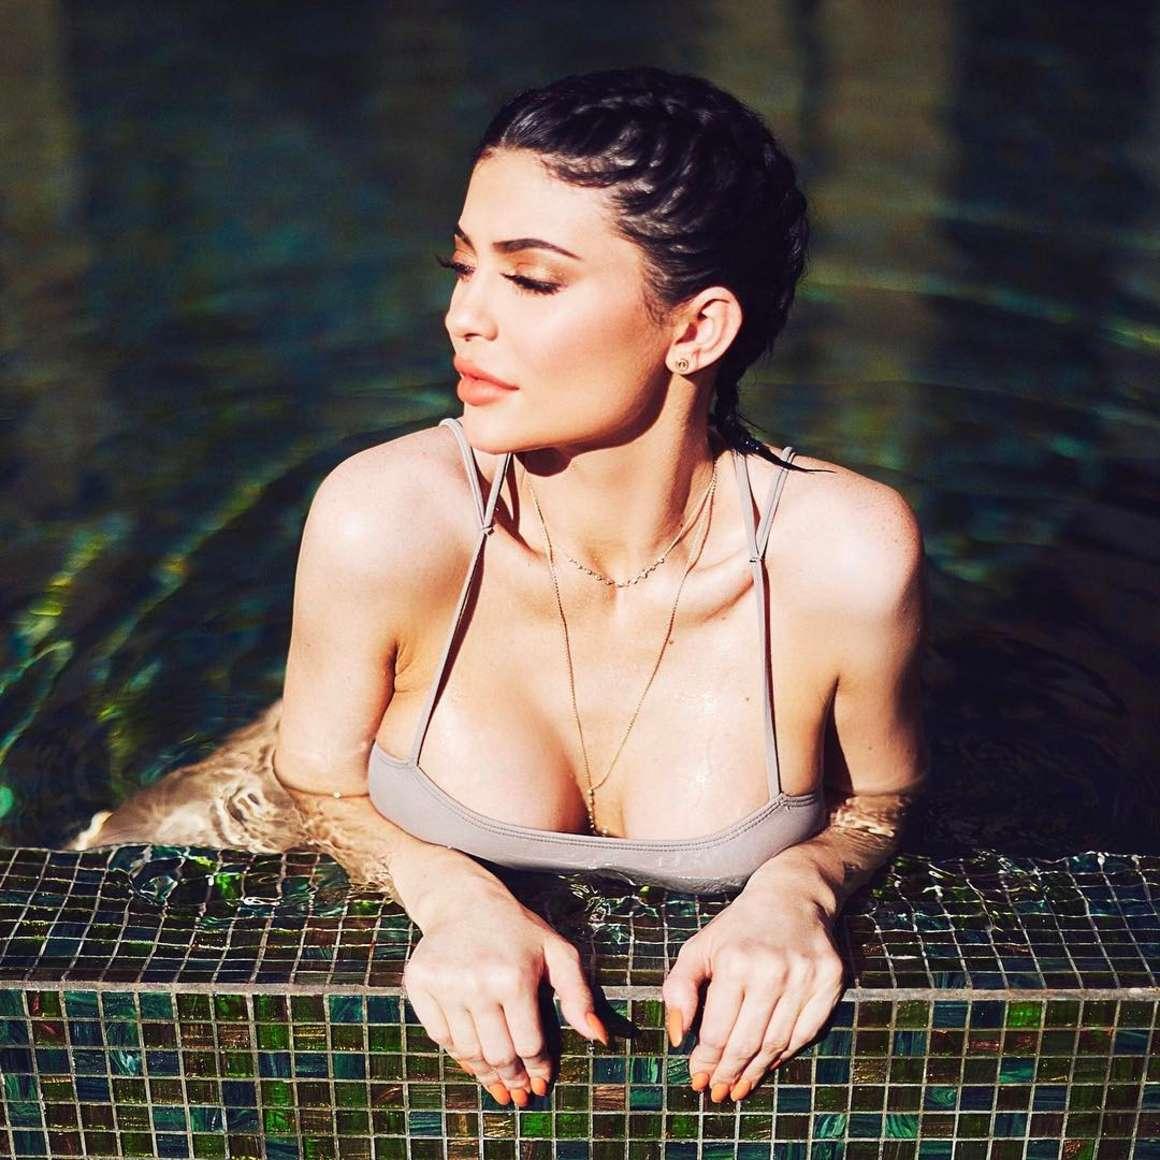 Kylie Jenner 2017 : Kylie Jenner in Bikini: Instagram Photos -03